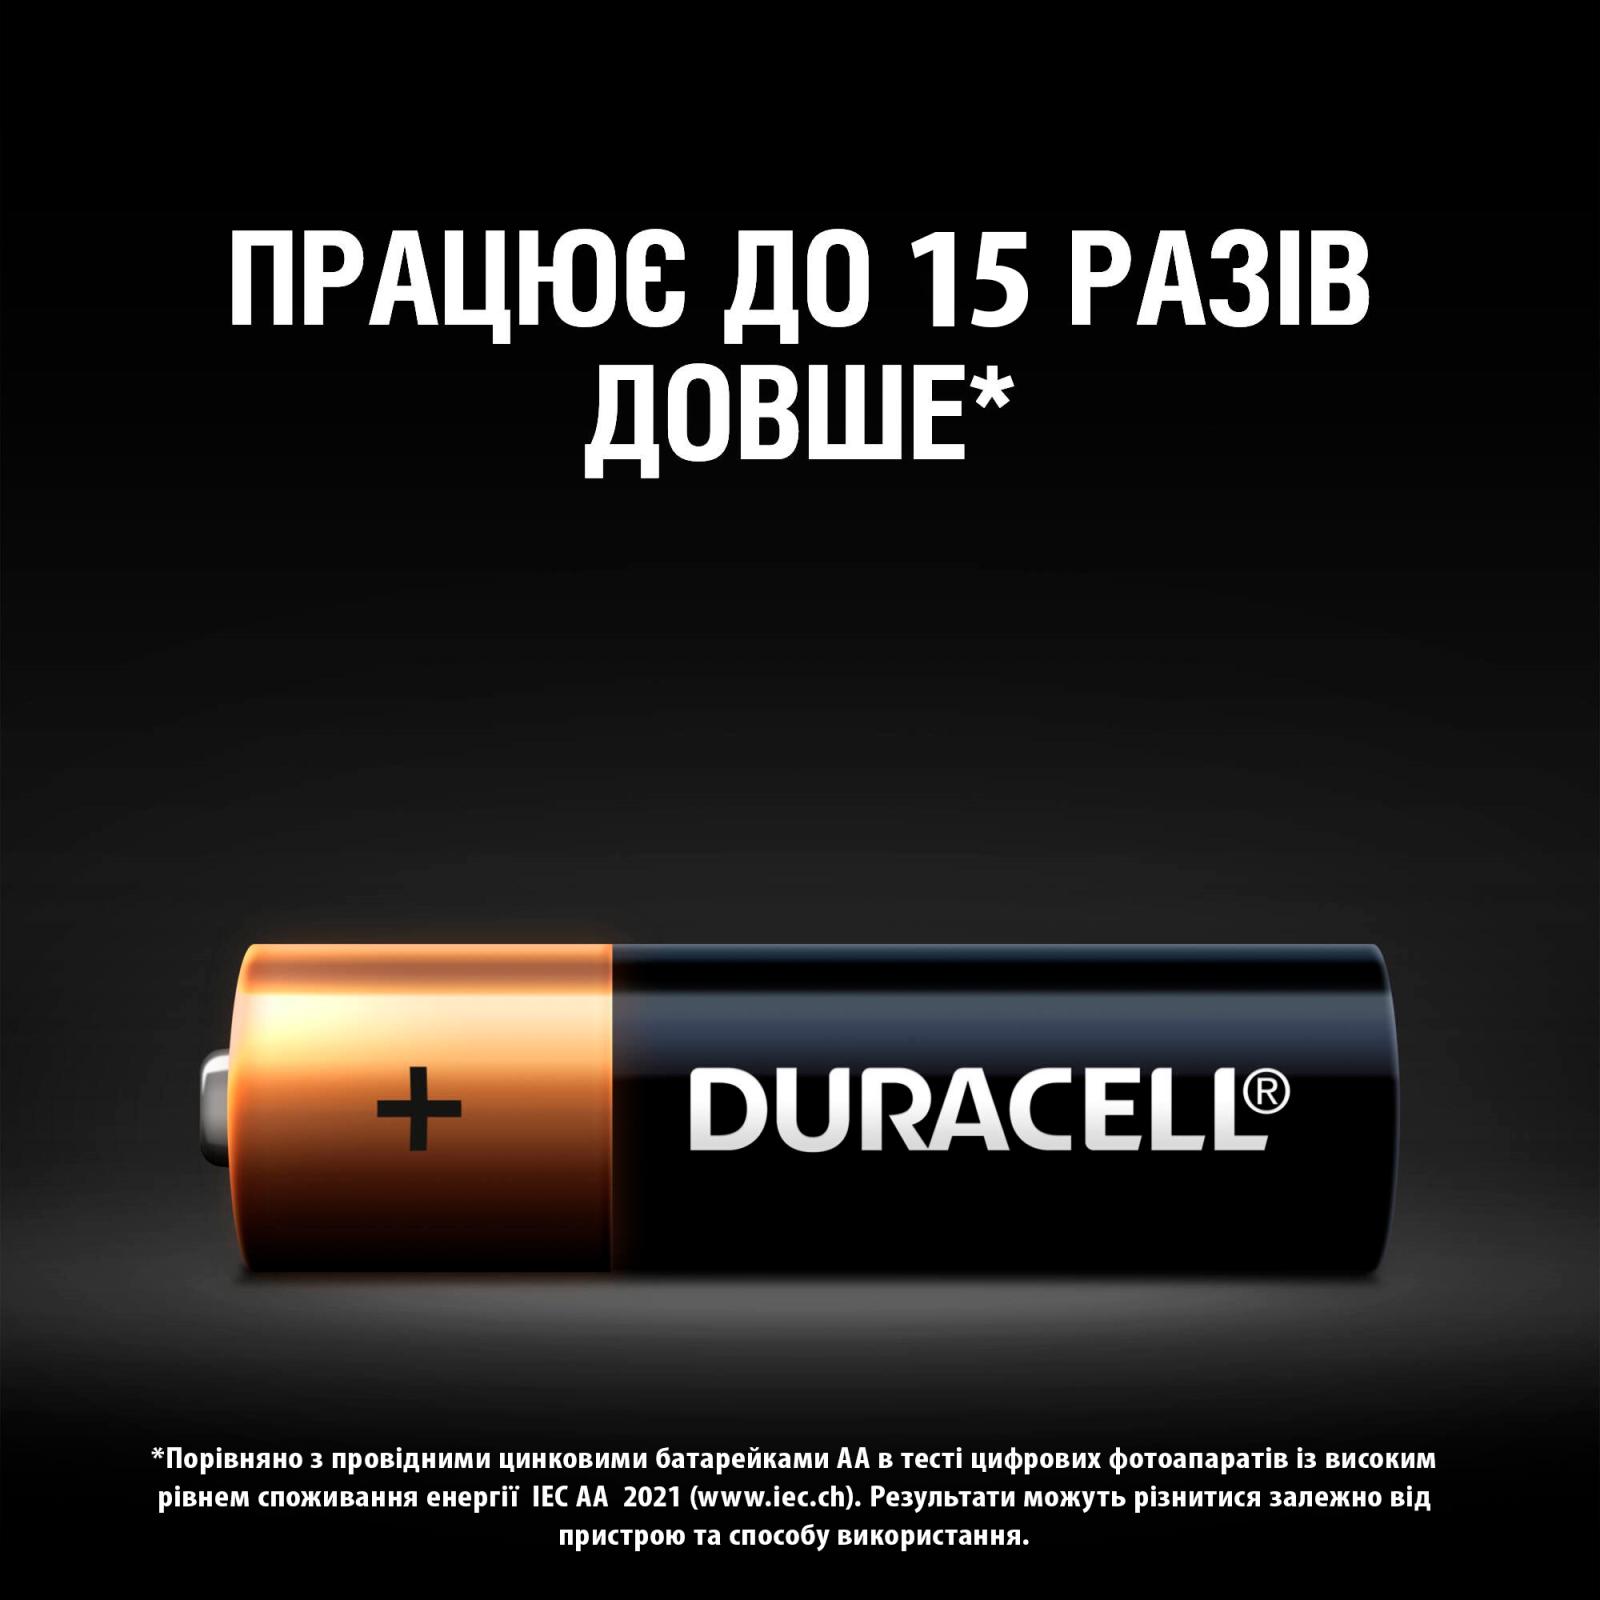 Батарейка Duracell AA MN1500 LR06 * 2 (5000394058163 / 81551267) изображение 4